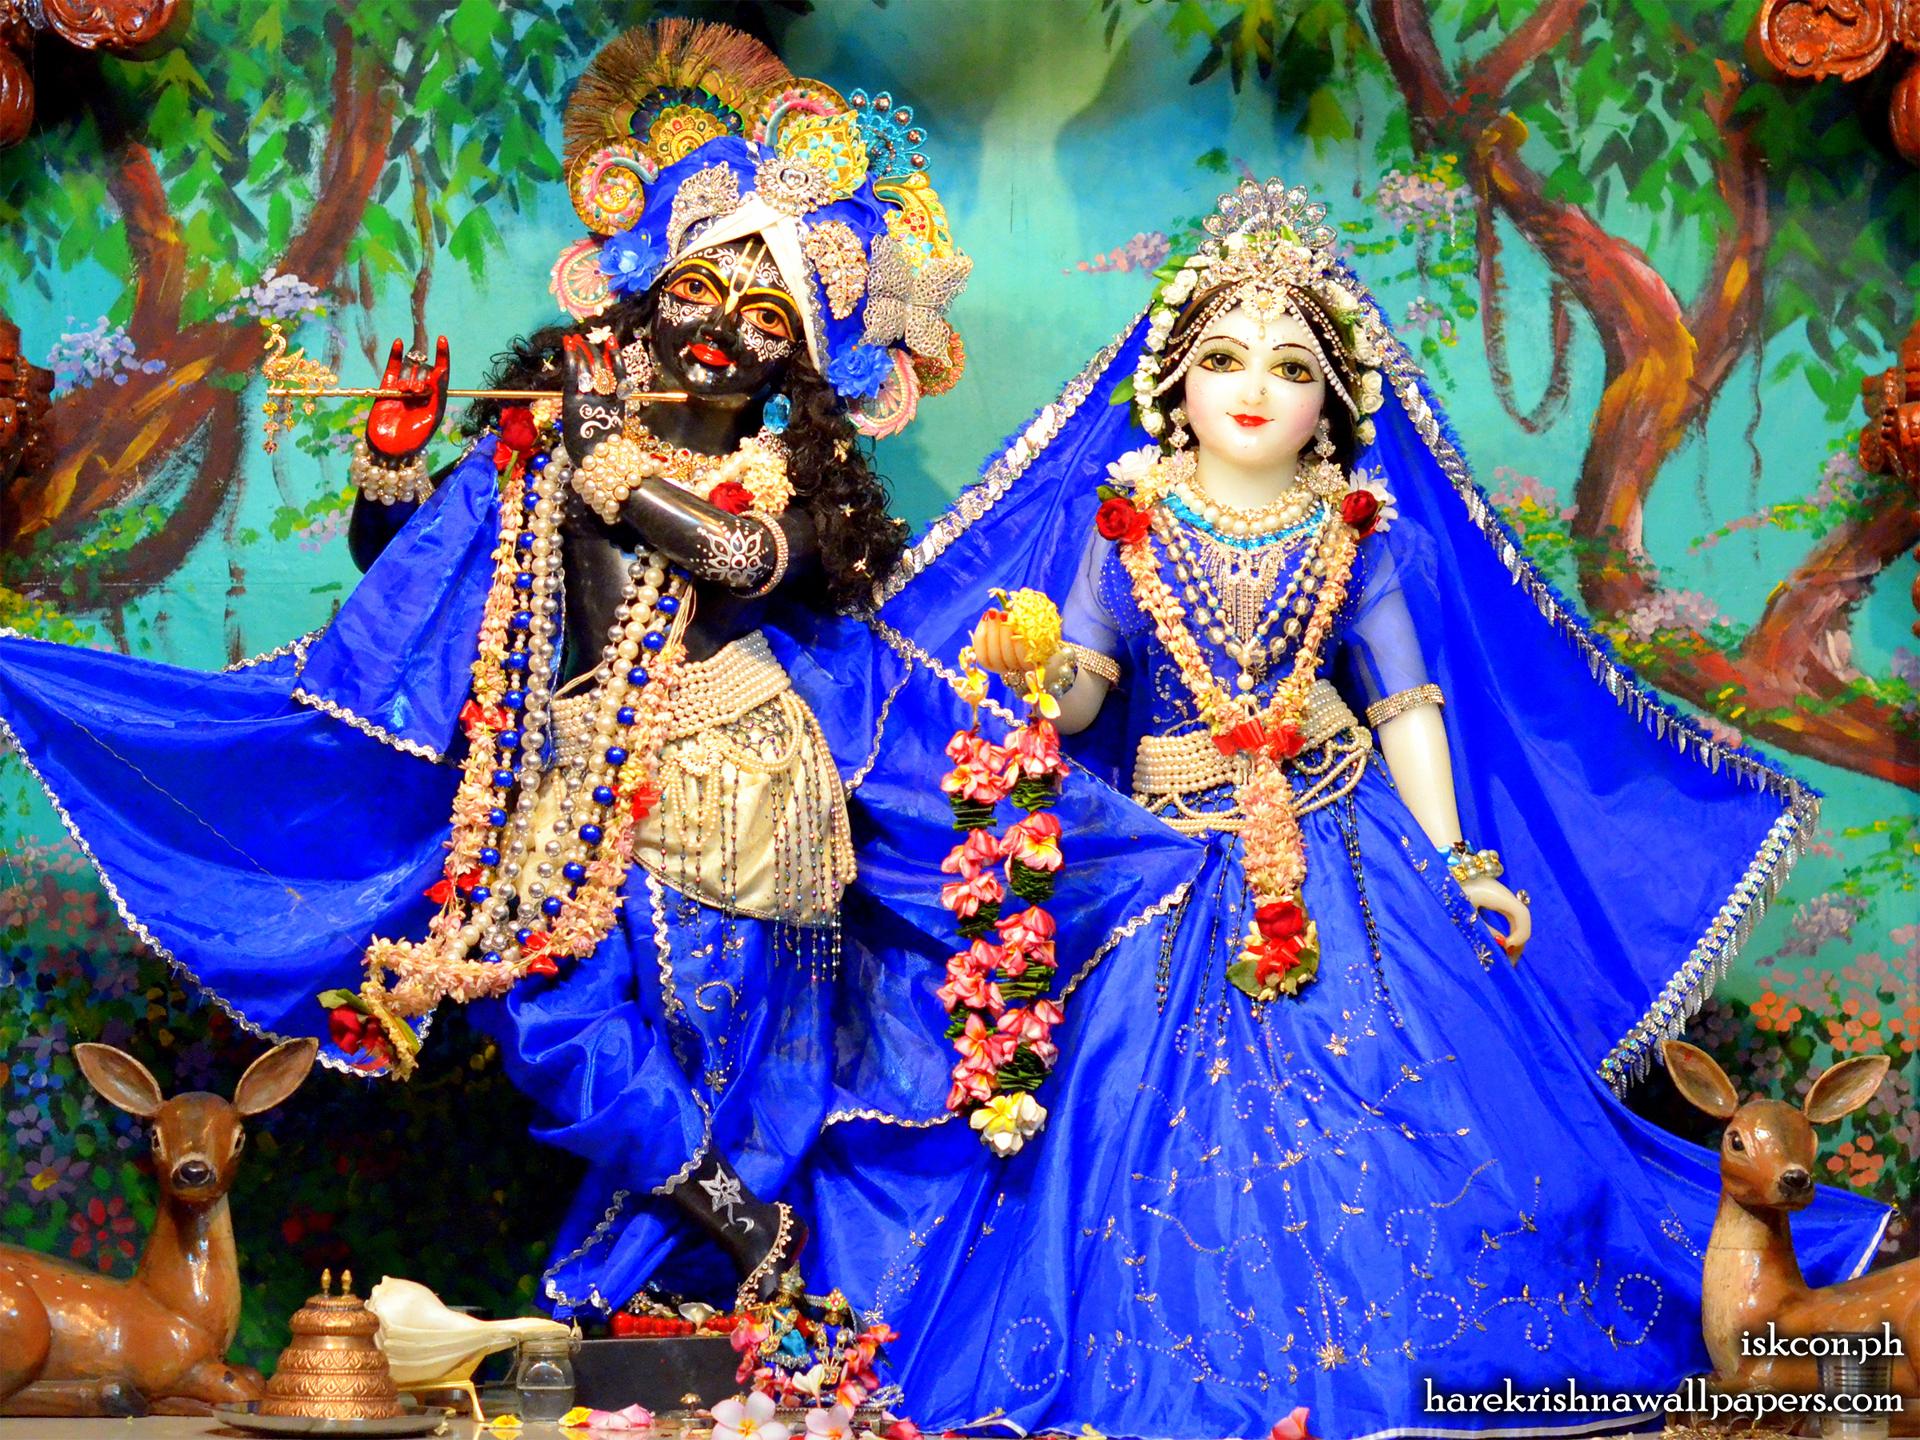 Sri Sri Radha Madhava Wallpaper (016) Size 1920x1440 Download